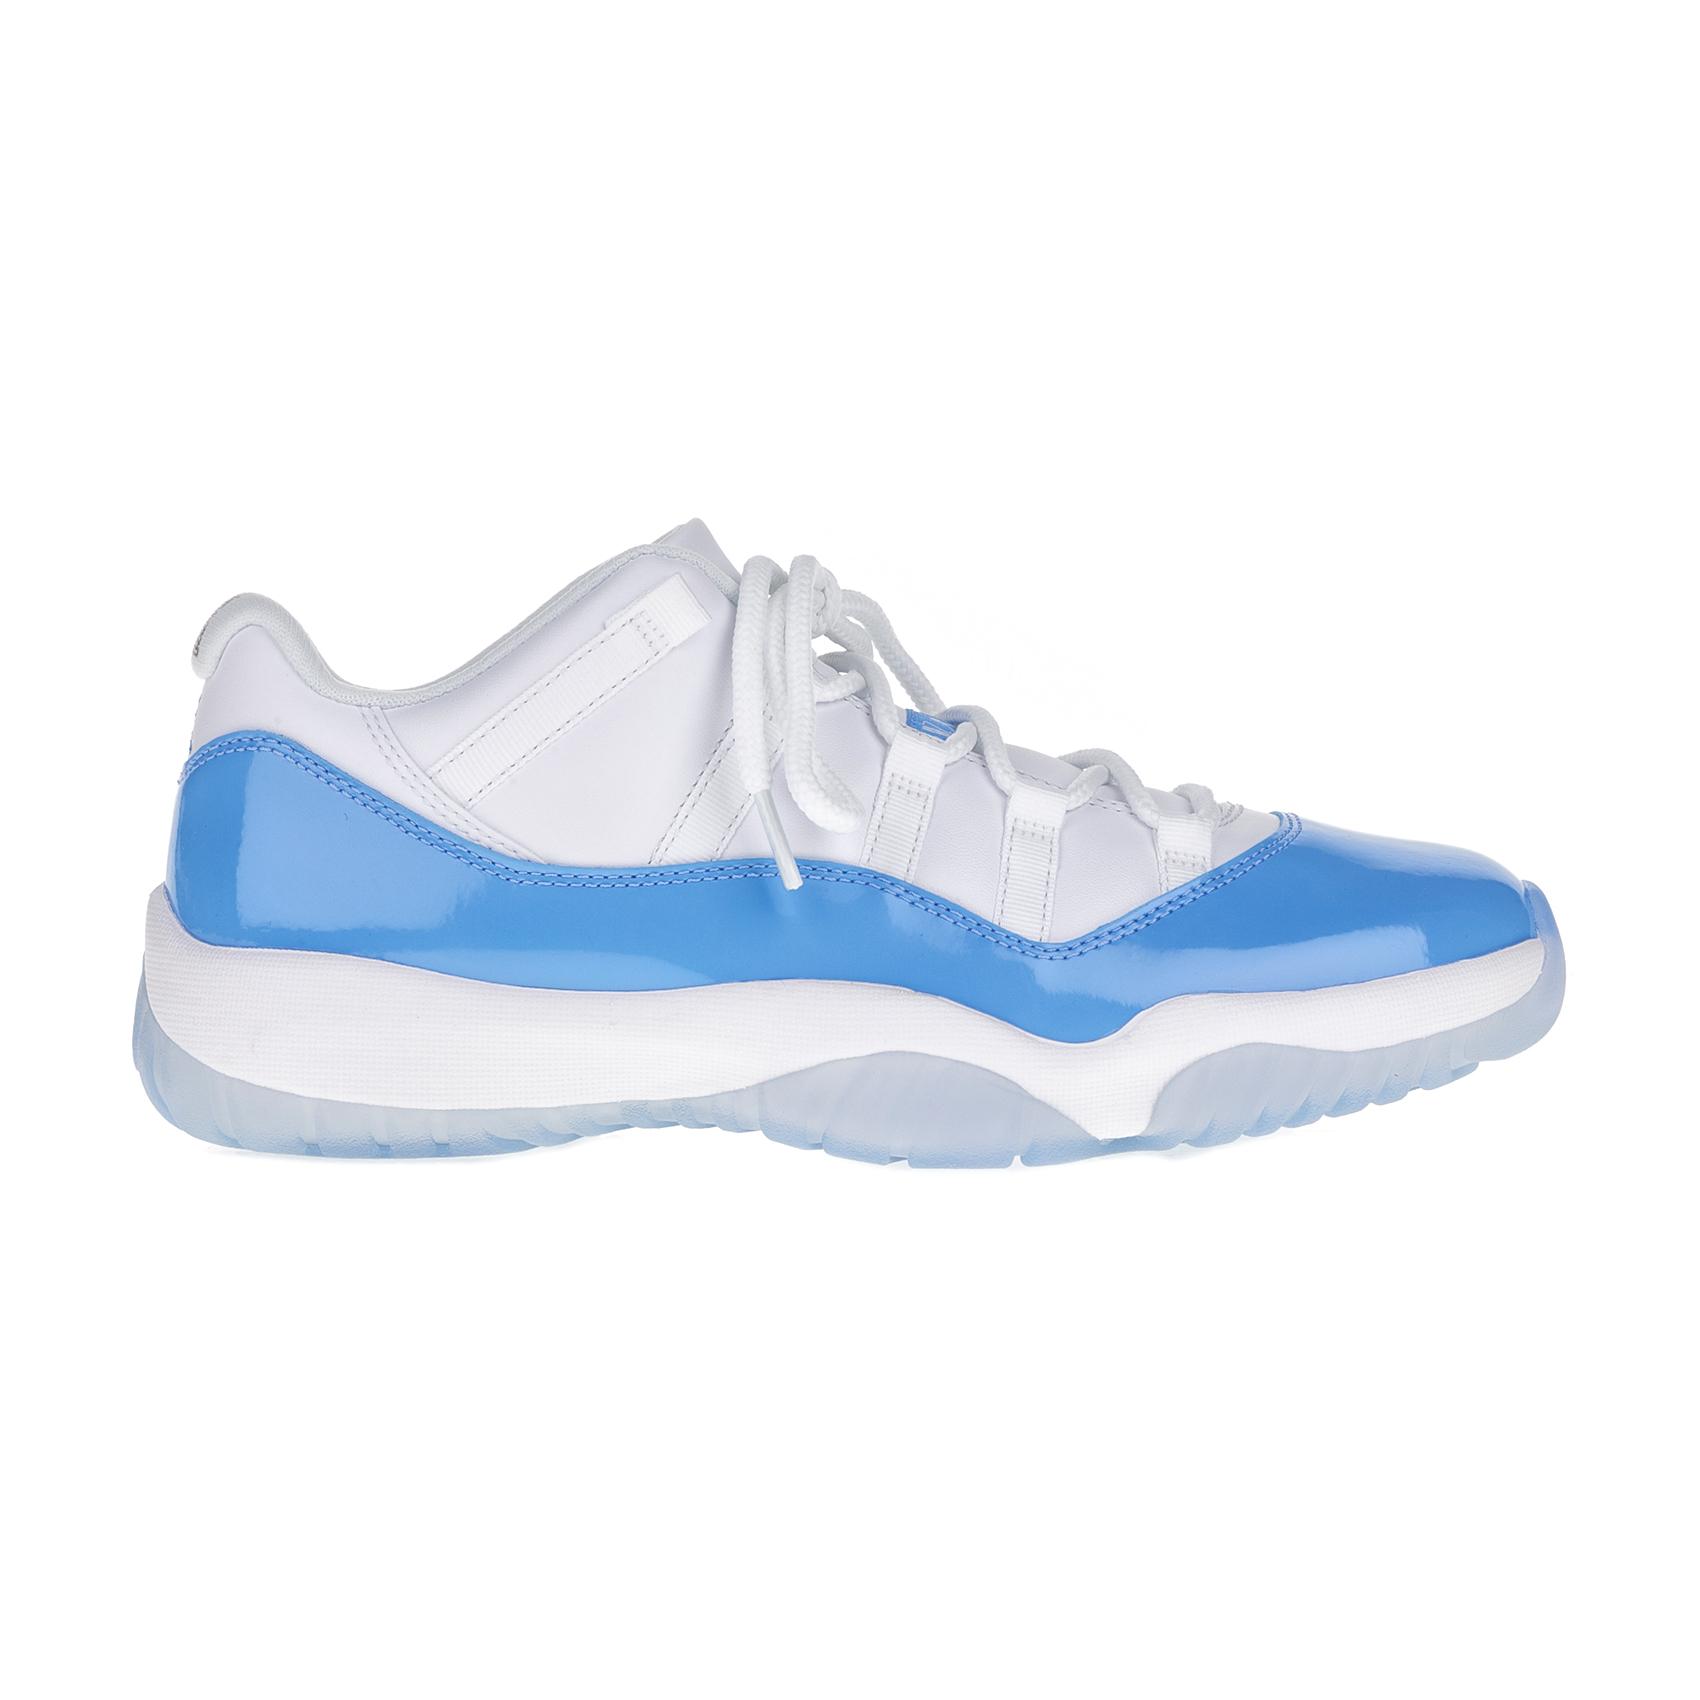 NIKE – Ανδρικά παπούτσια Nike AIR JORDAN 11 RETRO LOW λευκά – μπλε